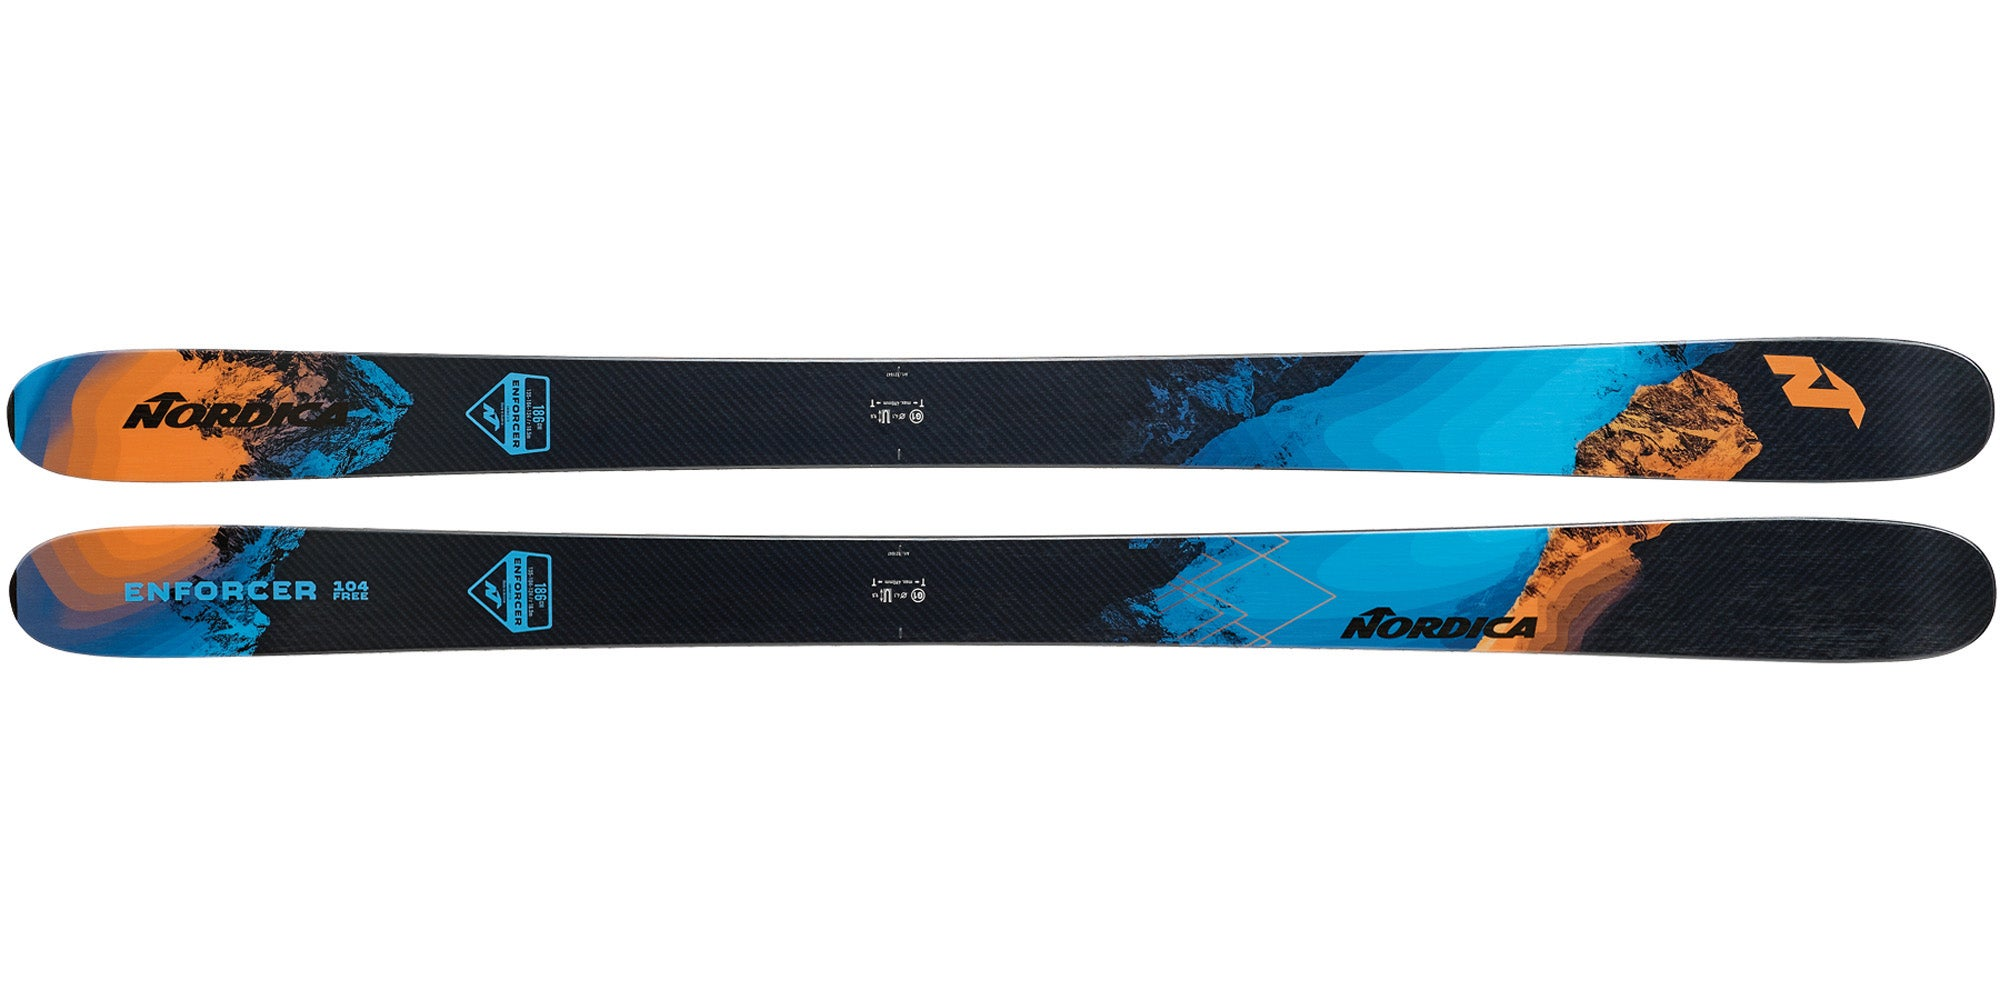 2021 Nordica Enforcer 104 Free Men's All-Mountain Wide Ski